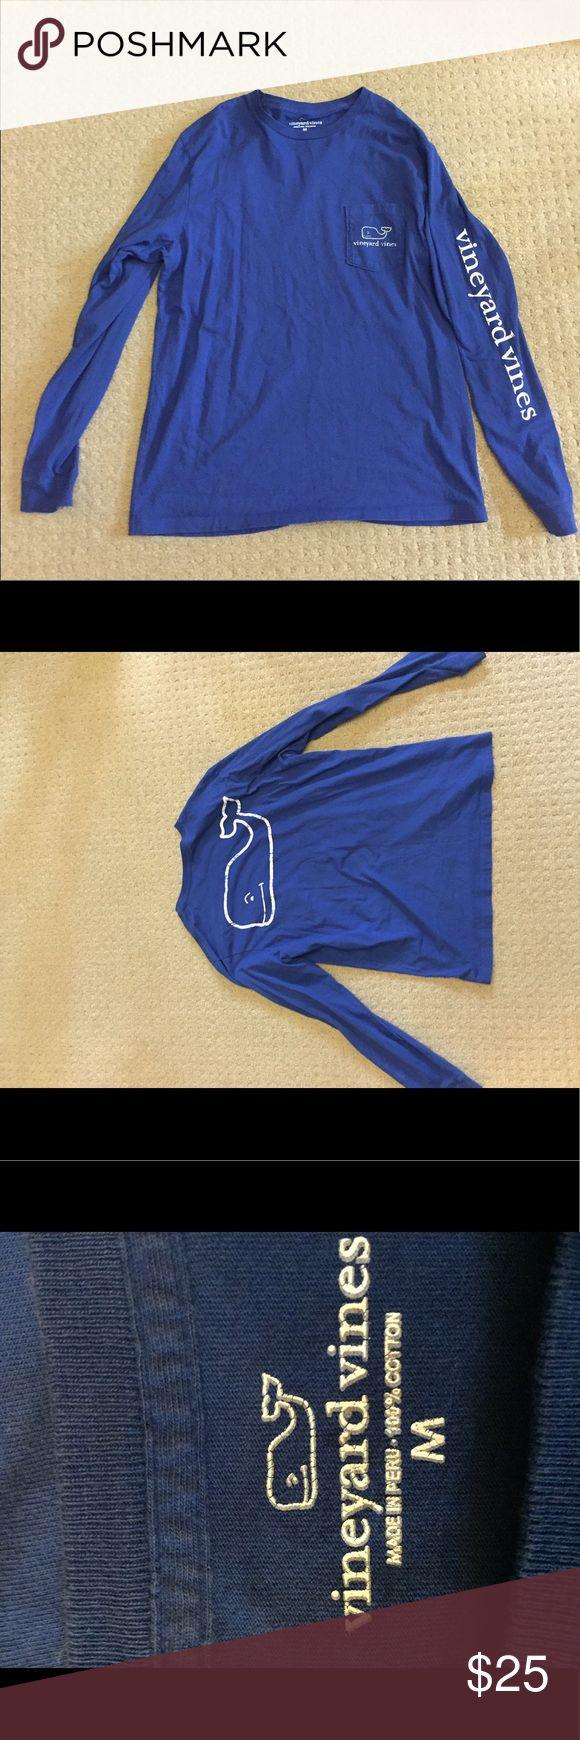 Vineyard vines long sleeve t-shirt Perfect condition vineyard vines tee. Worn once or twice. Vineyard Vines Shirts Tees - Long Sleeve